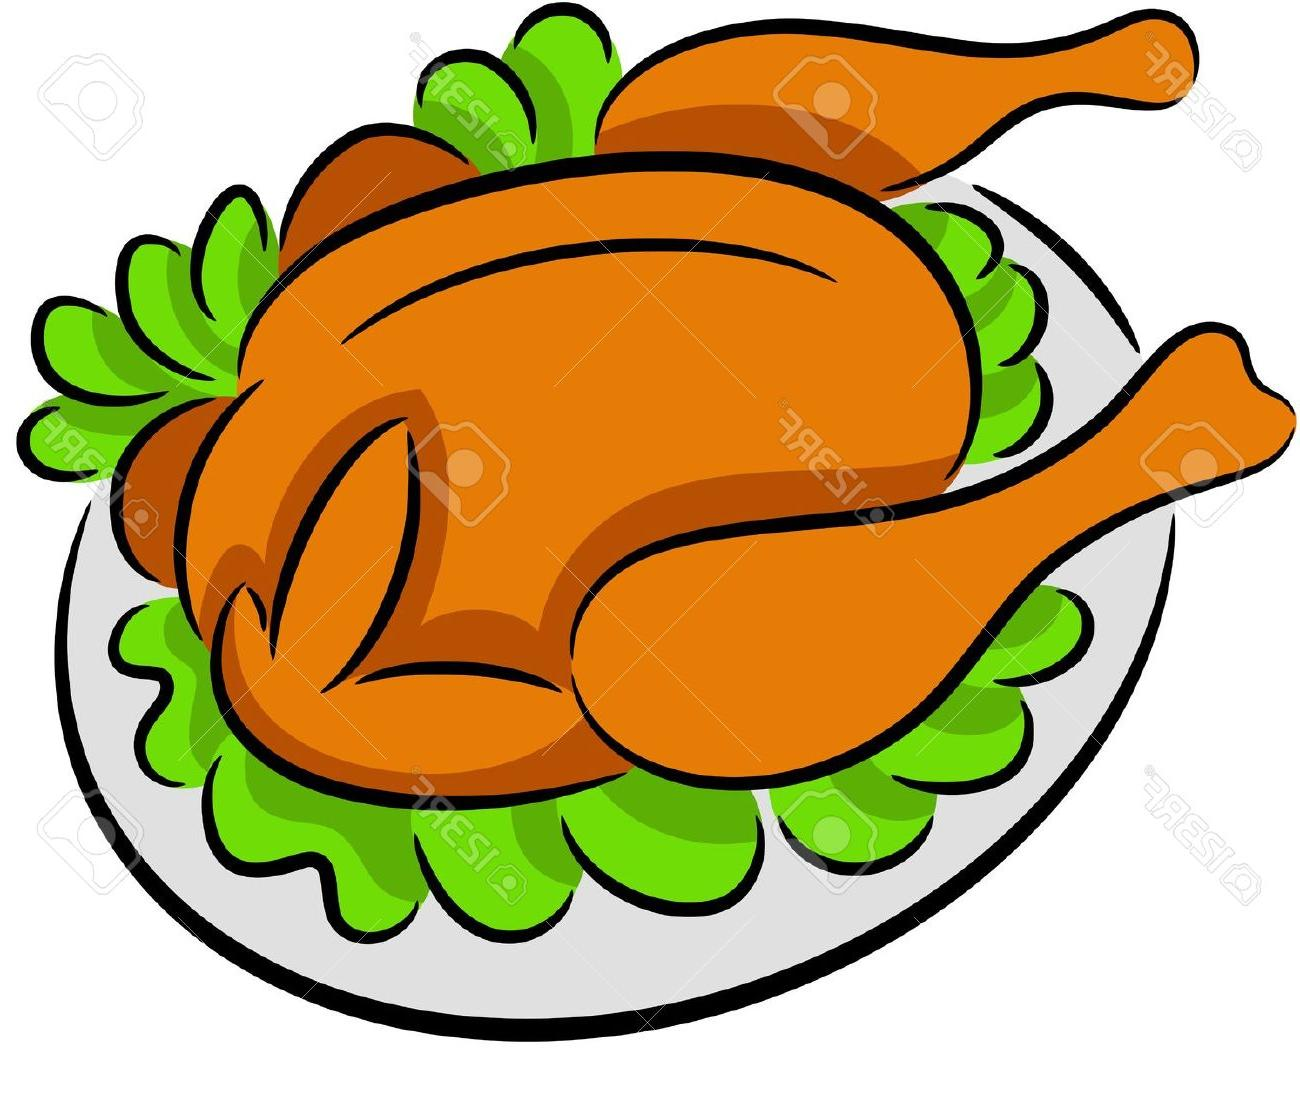 Grilled Chicken Clipart.